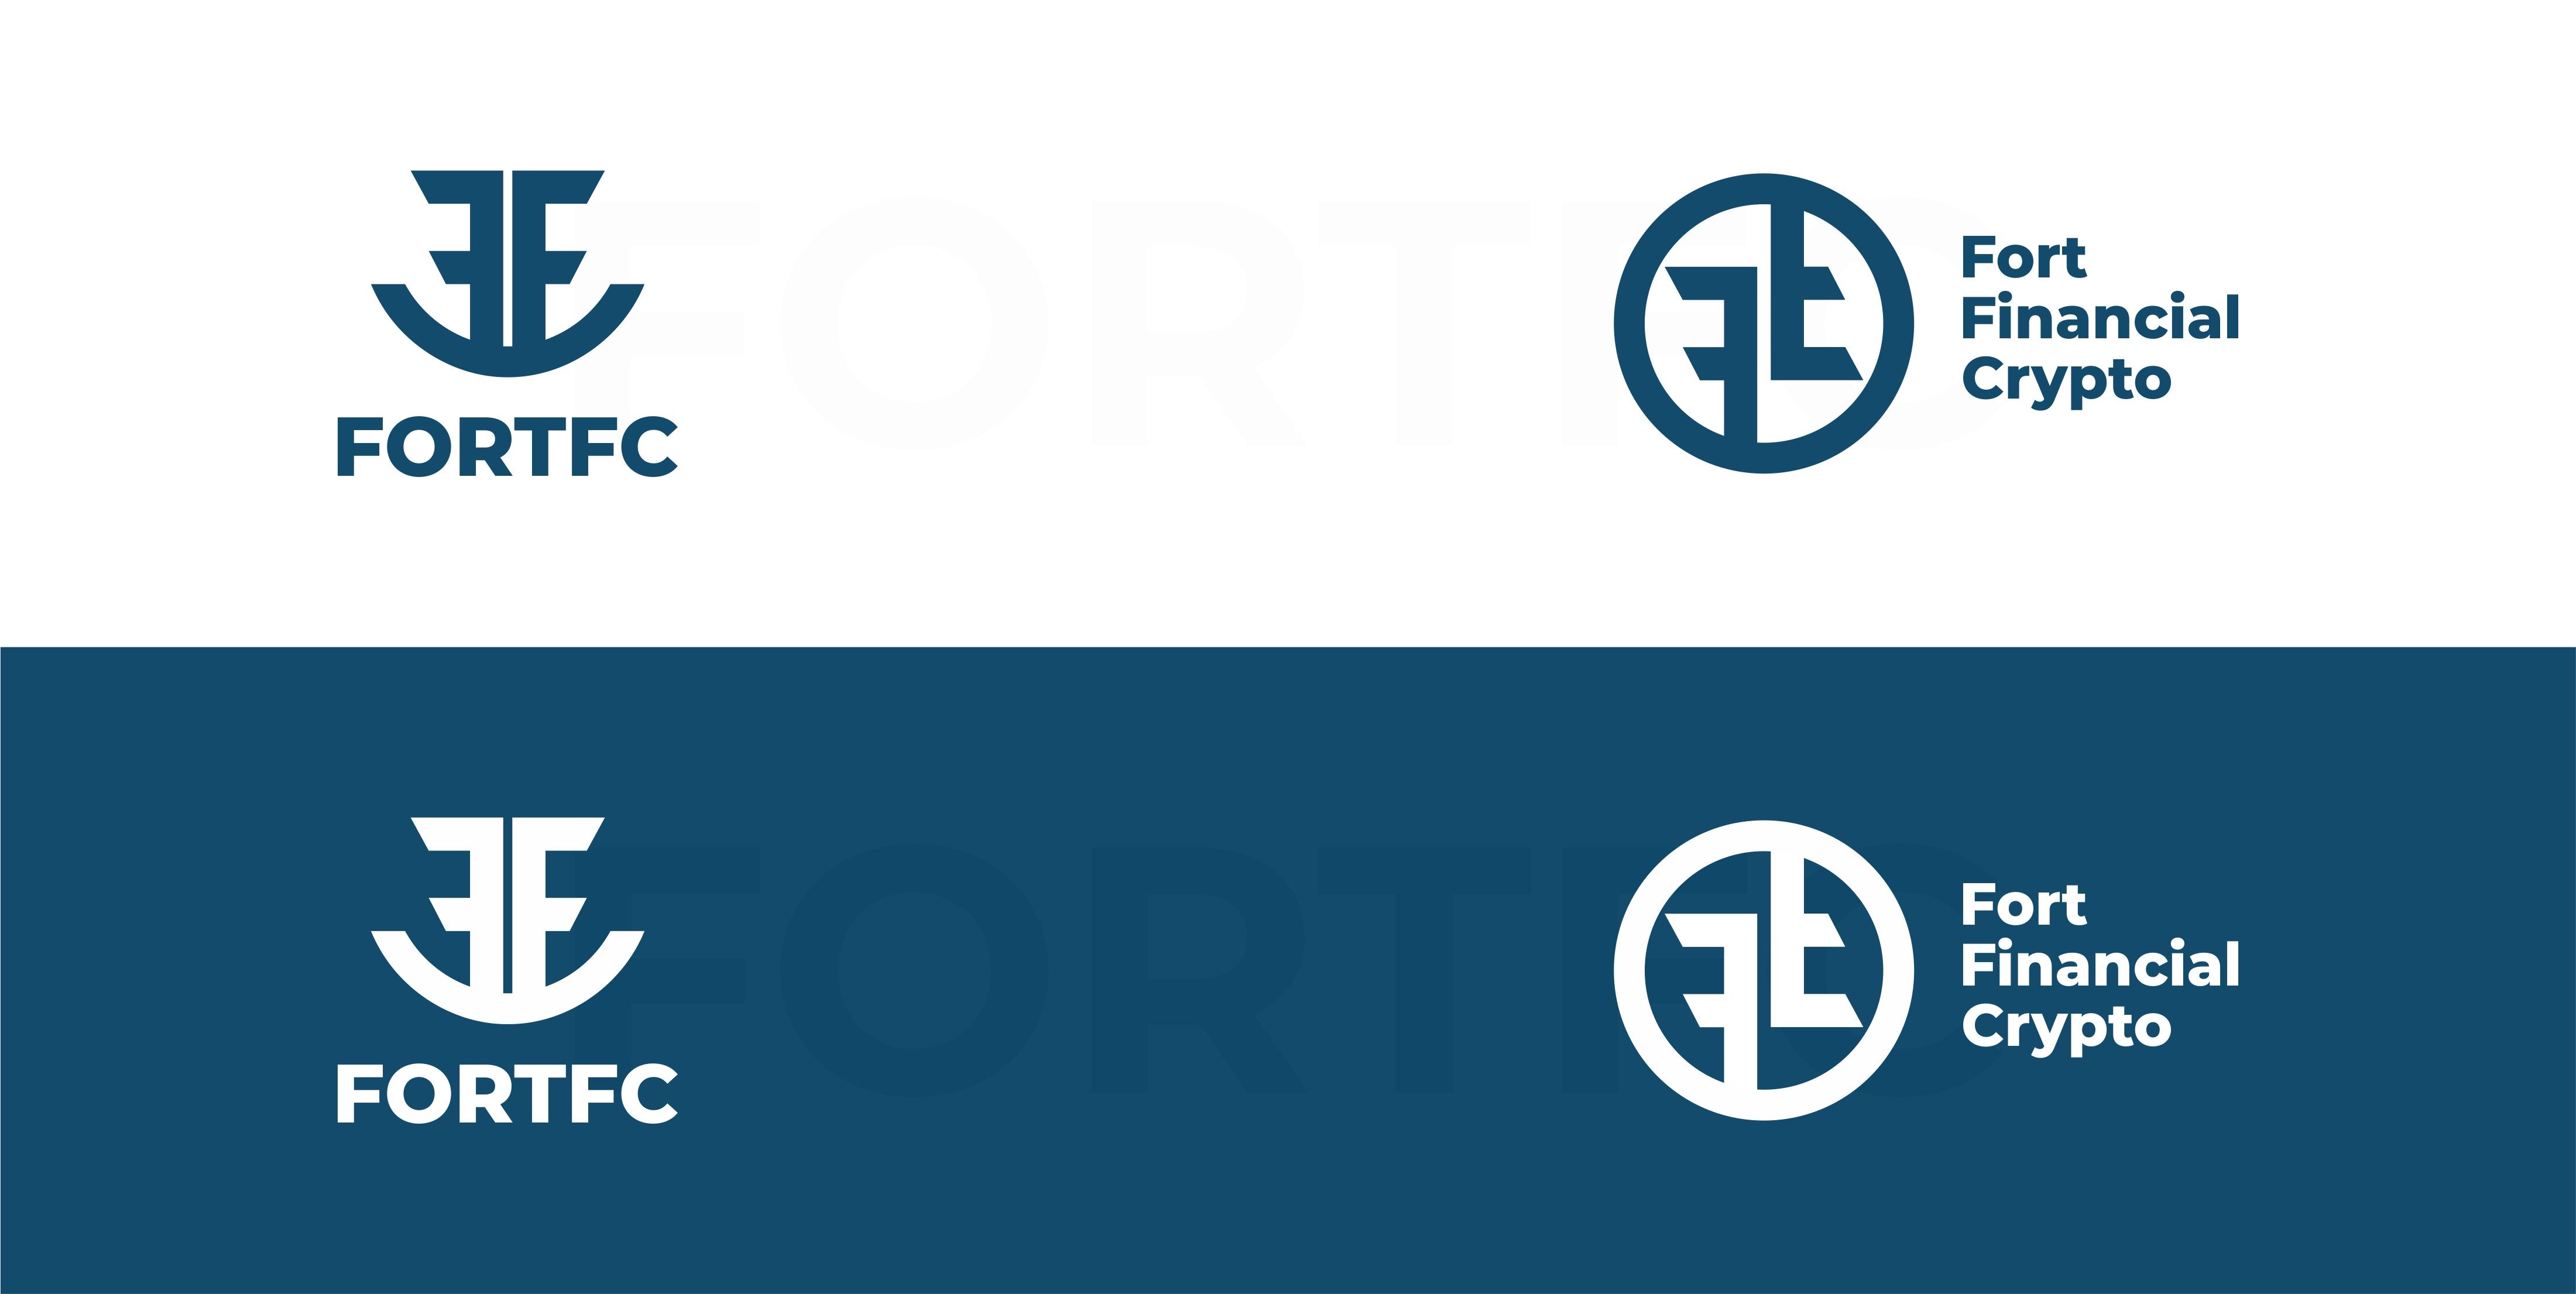 Разработка логотипа финансовой компании фото f_1175a872ee458f43.jpg